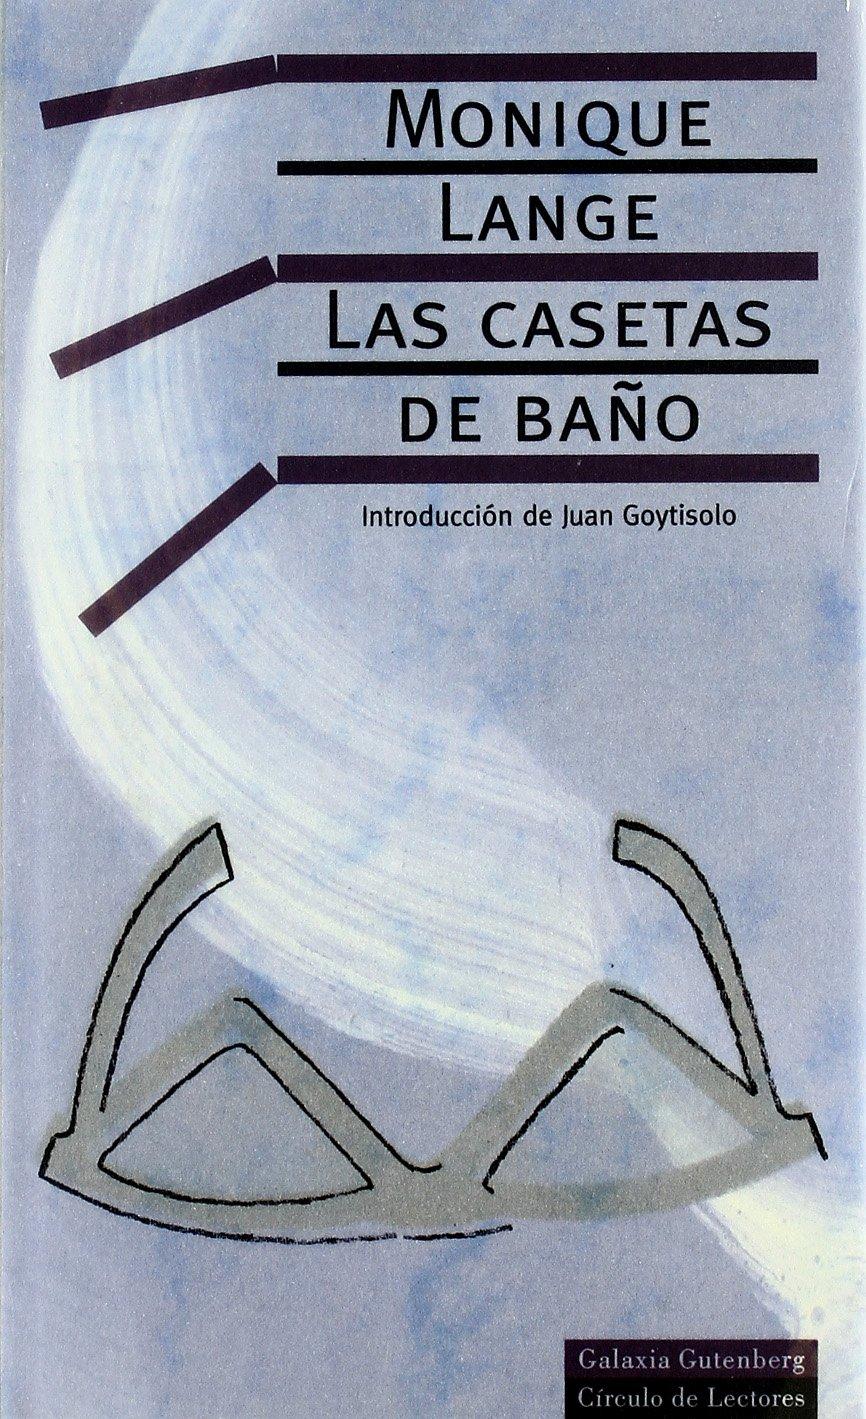 Las casetas de bano/ Bathroom Stalls (Spanish Edition) (Spanish) Hardcover – June 30, 1997